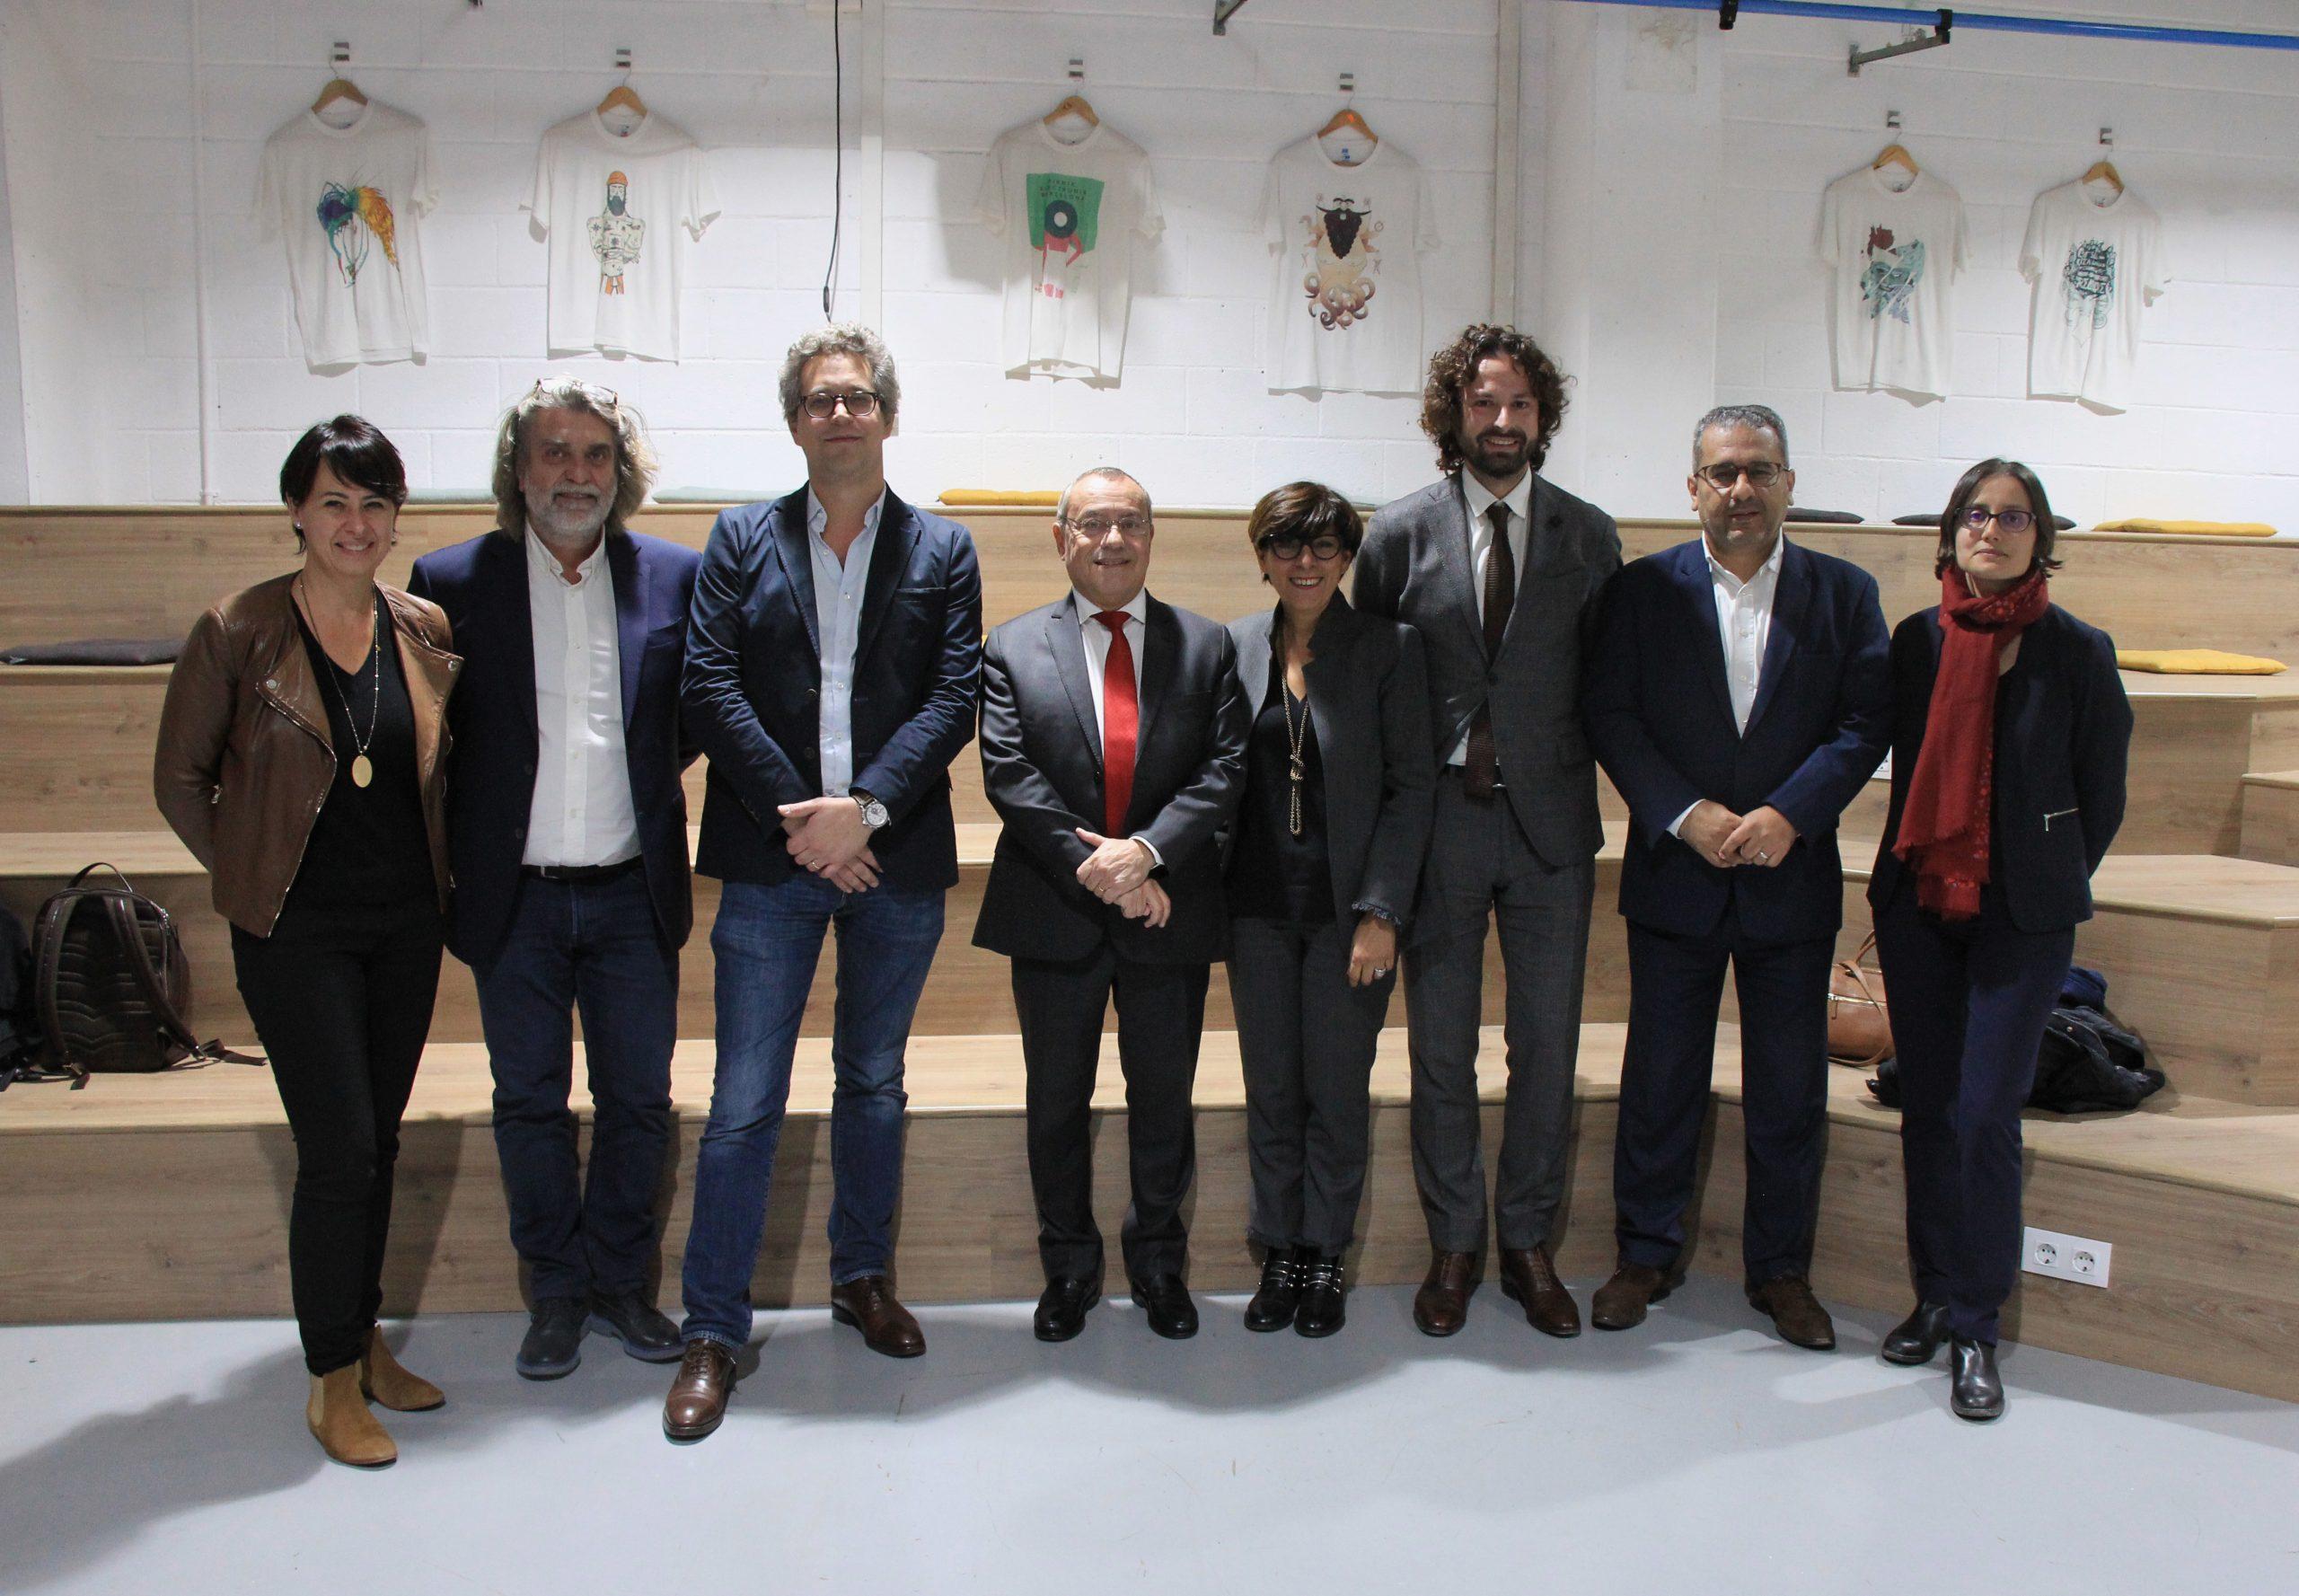 {AMBASSADEUR DE FRANCE A L'IDEM} M.Jean-Michel Casa s'est rendu à l'Idem de Barcelone !